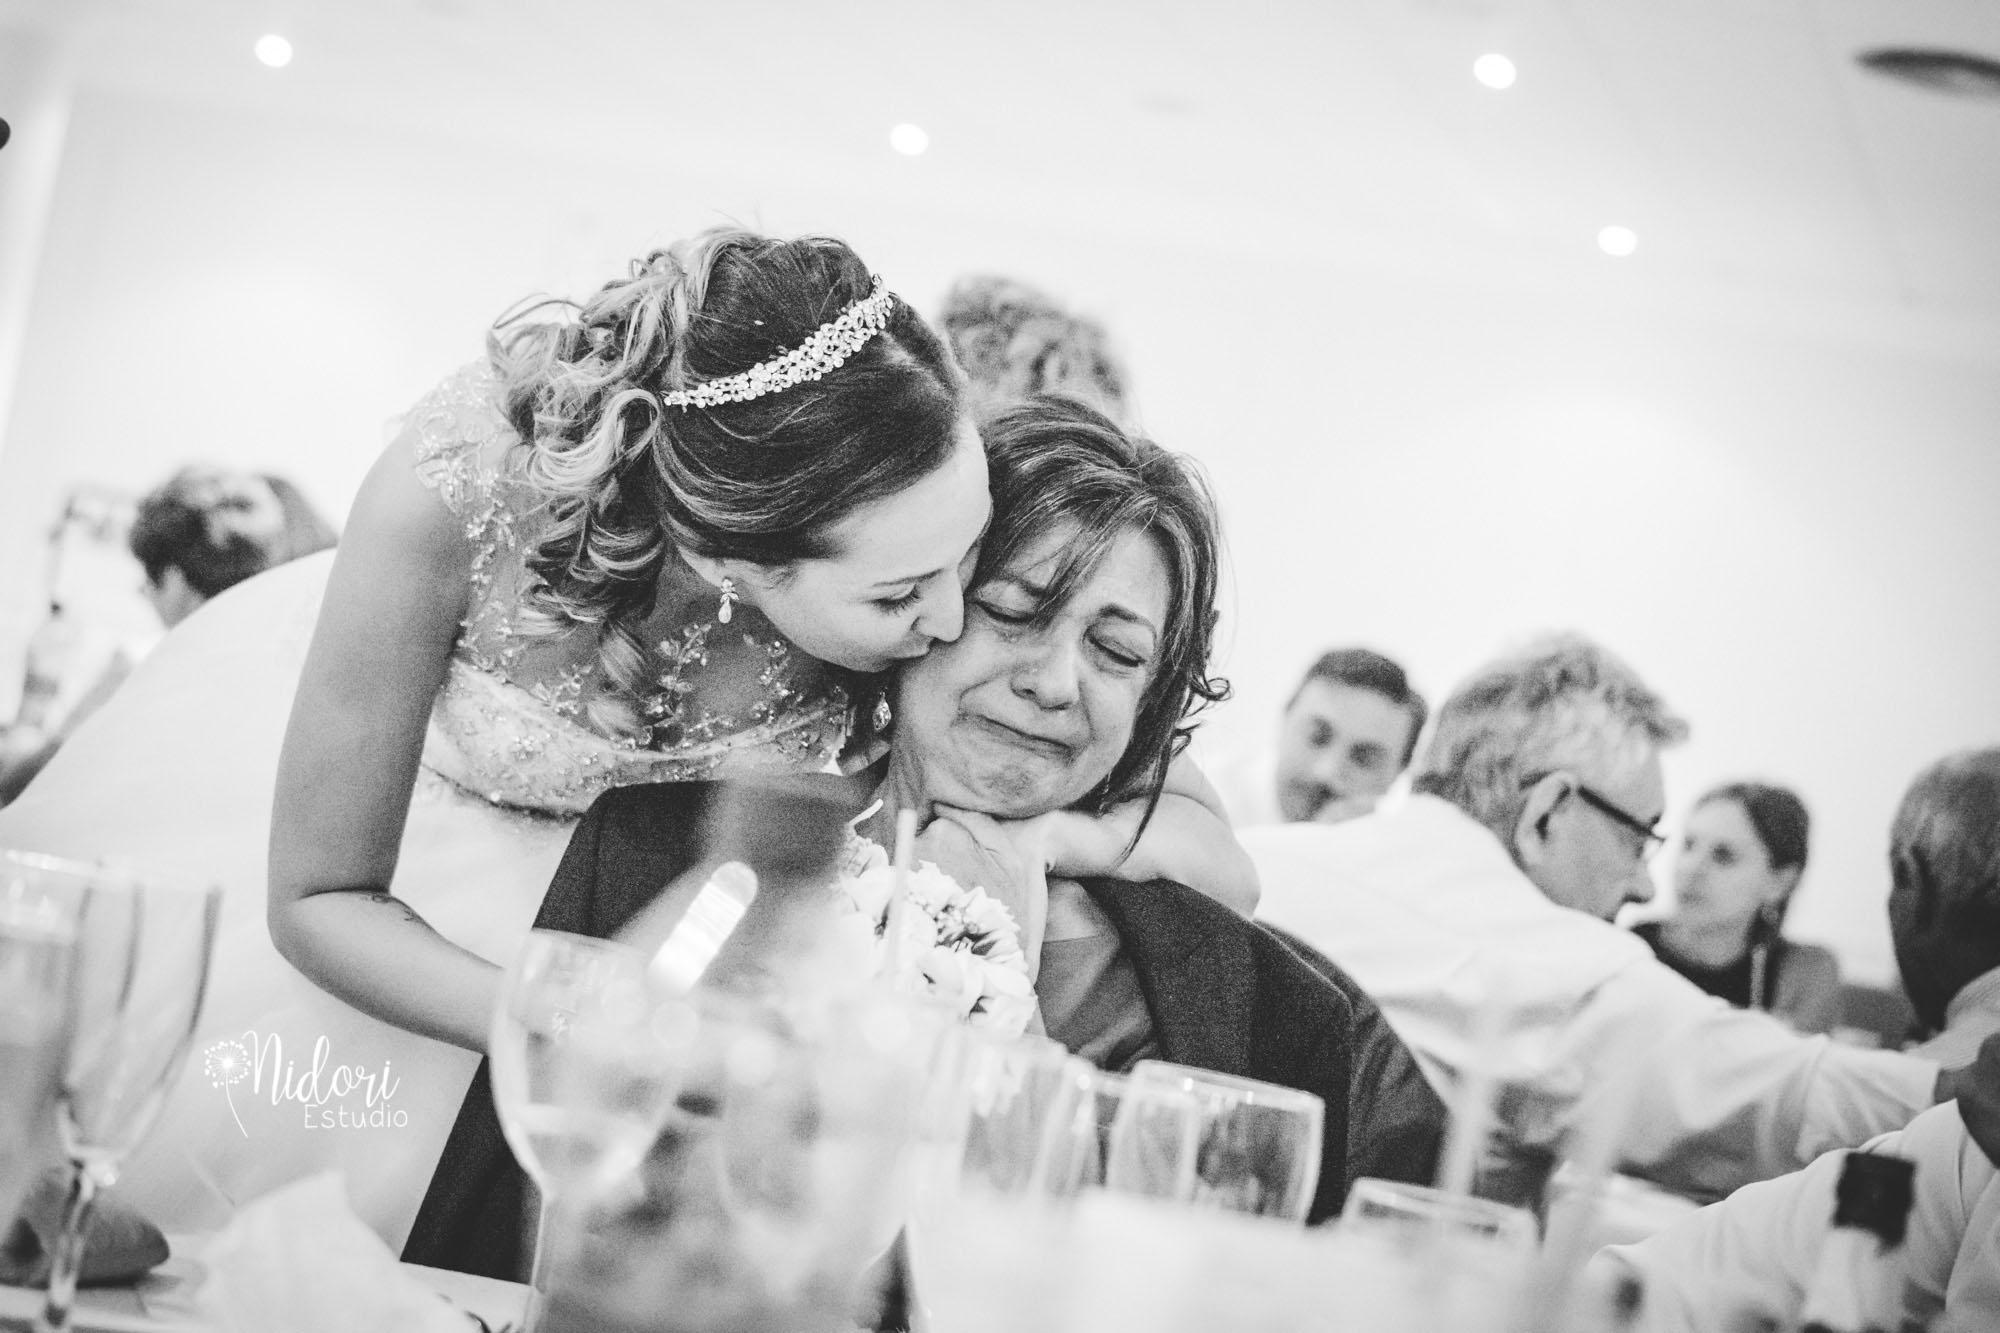 fotos-de-boda-reportaje-novios-fotografia-boda-nidoriestudio-fotos-valencia-almazora-castellon-españa-spain-022